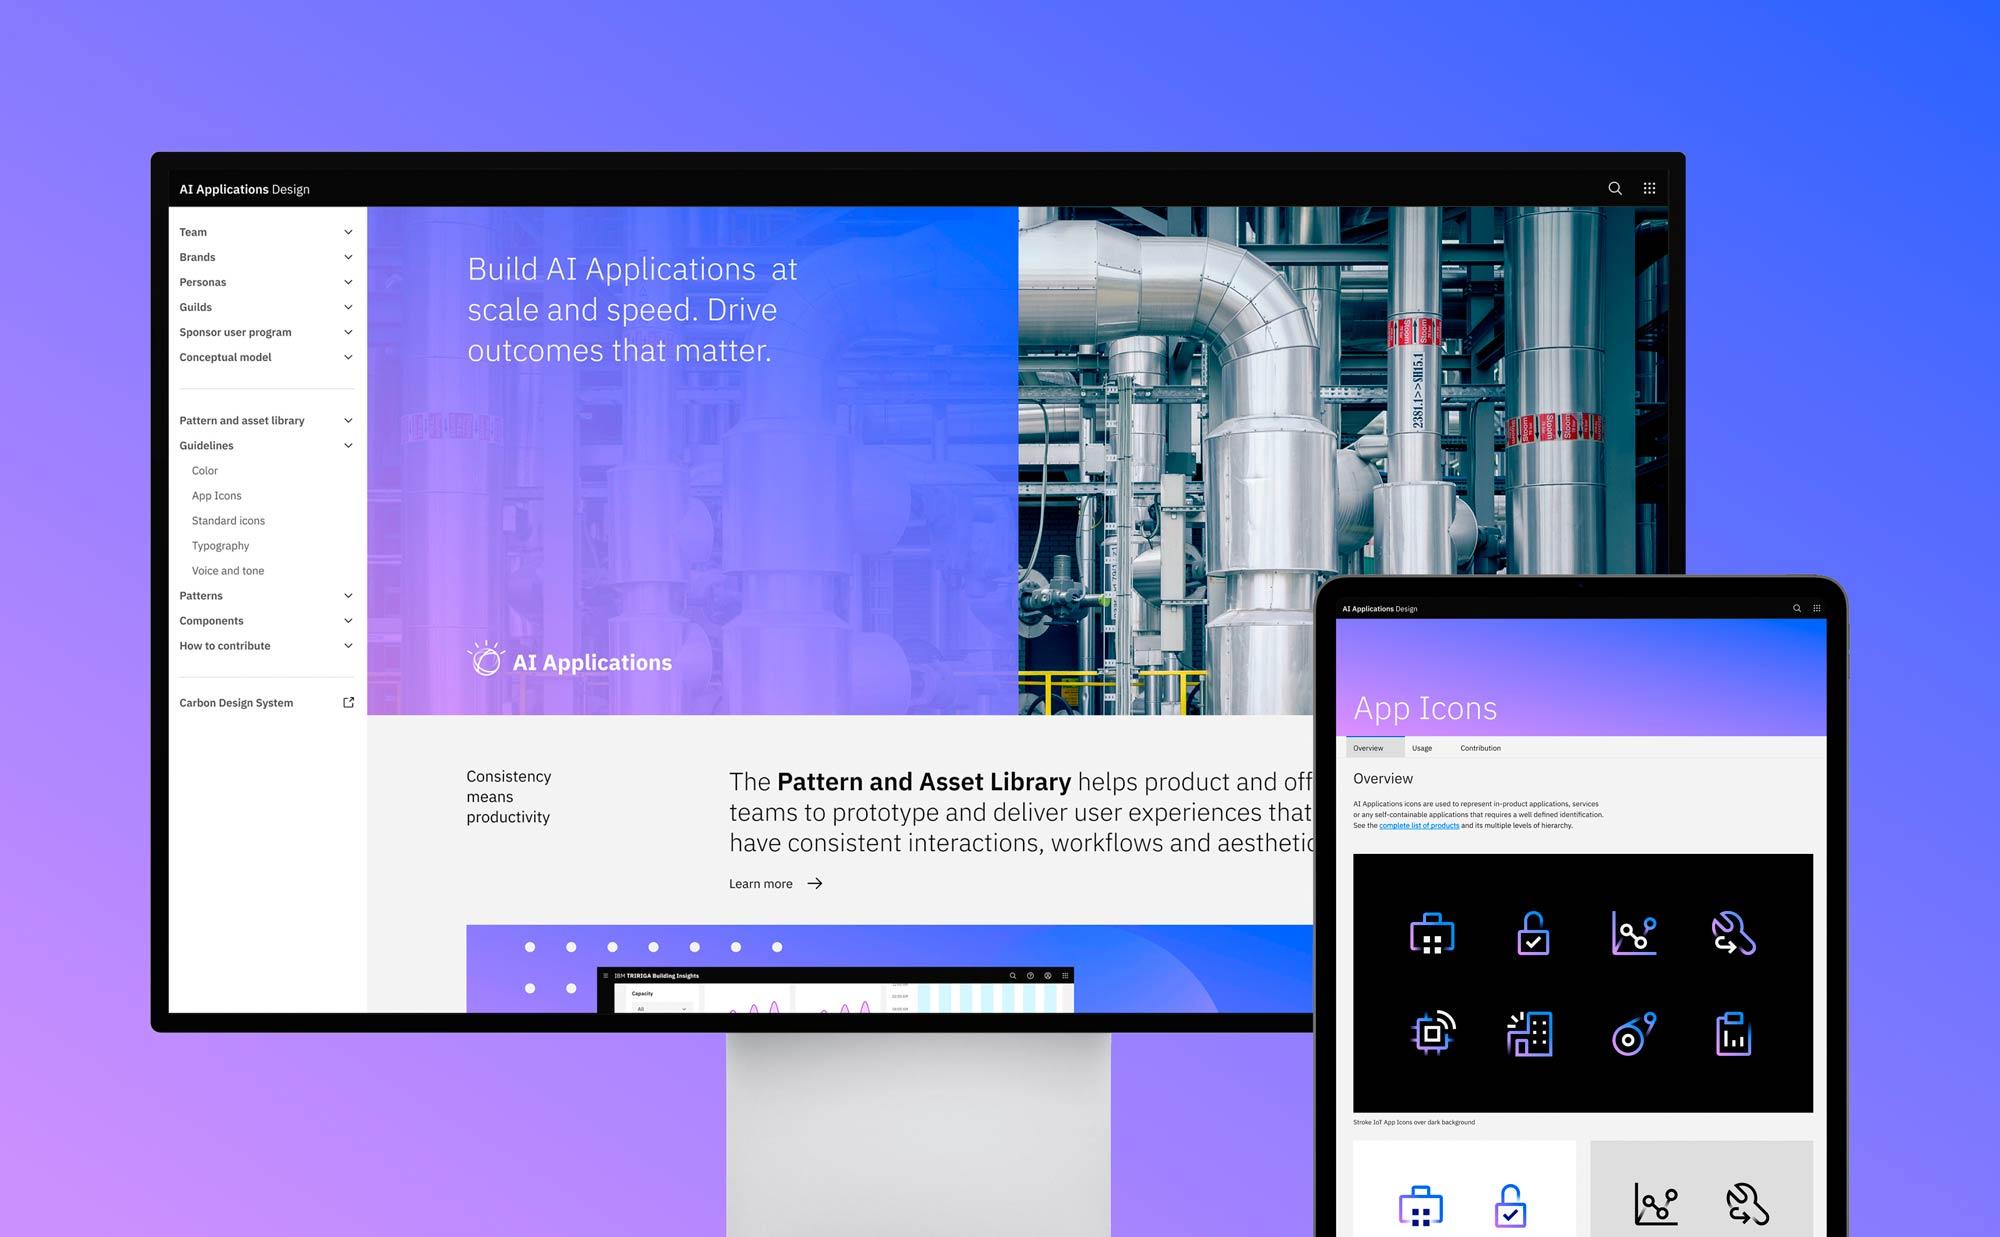 IBM AI Applications visual design guidelines